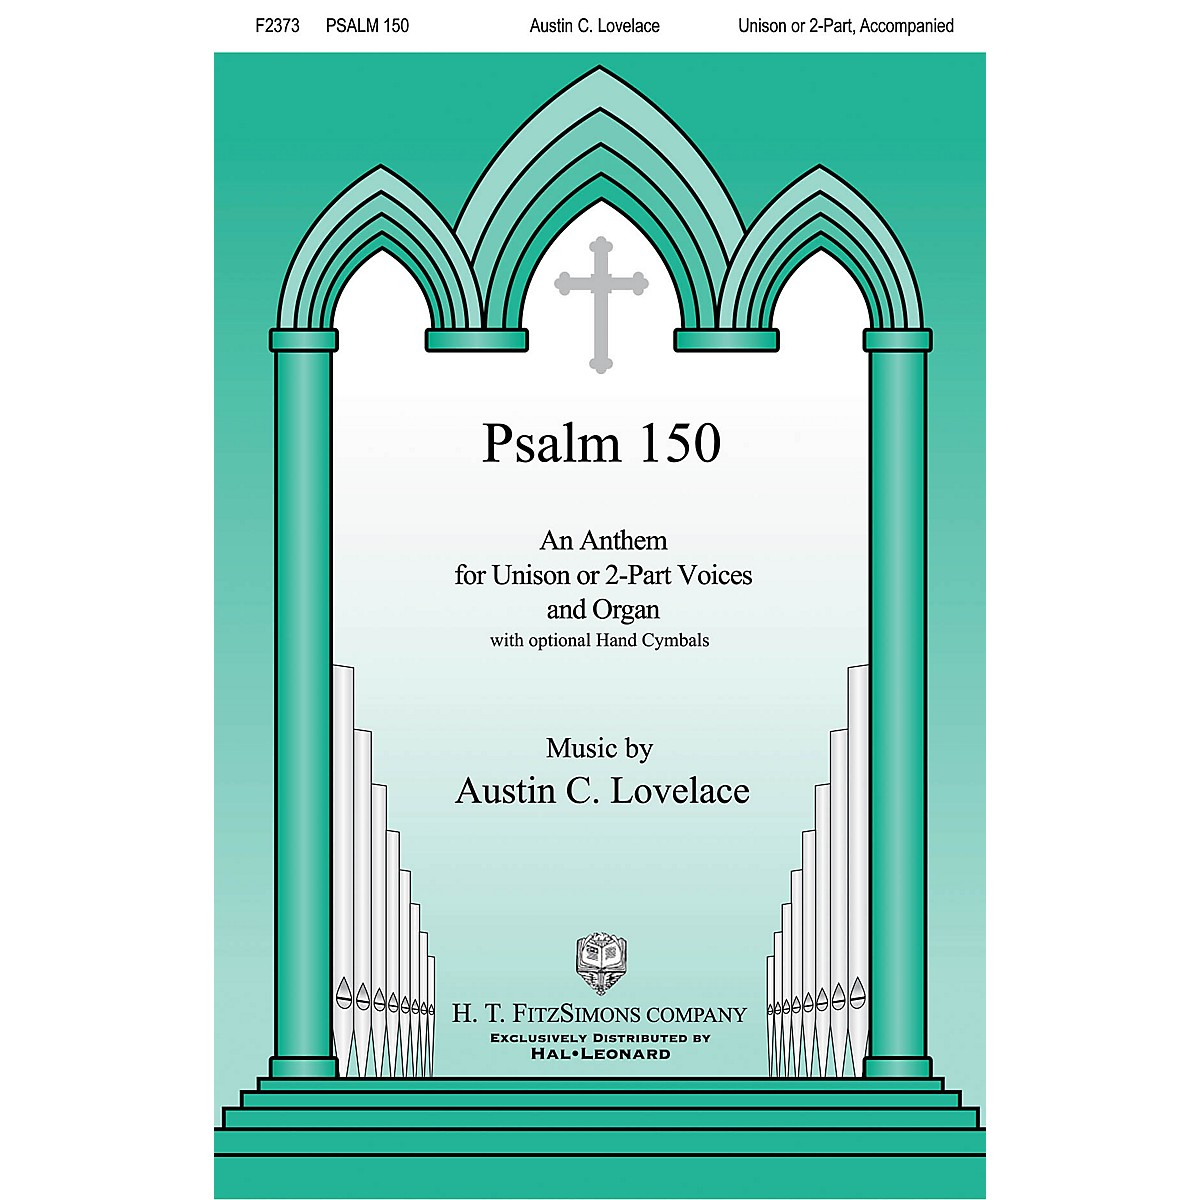 H.T. FitzSimons Company Psalm 150 UNIS/2PT composed by Austin Lovelace